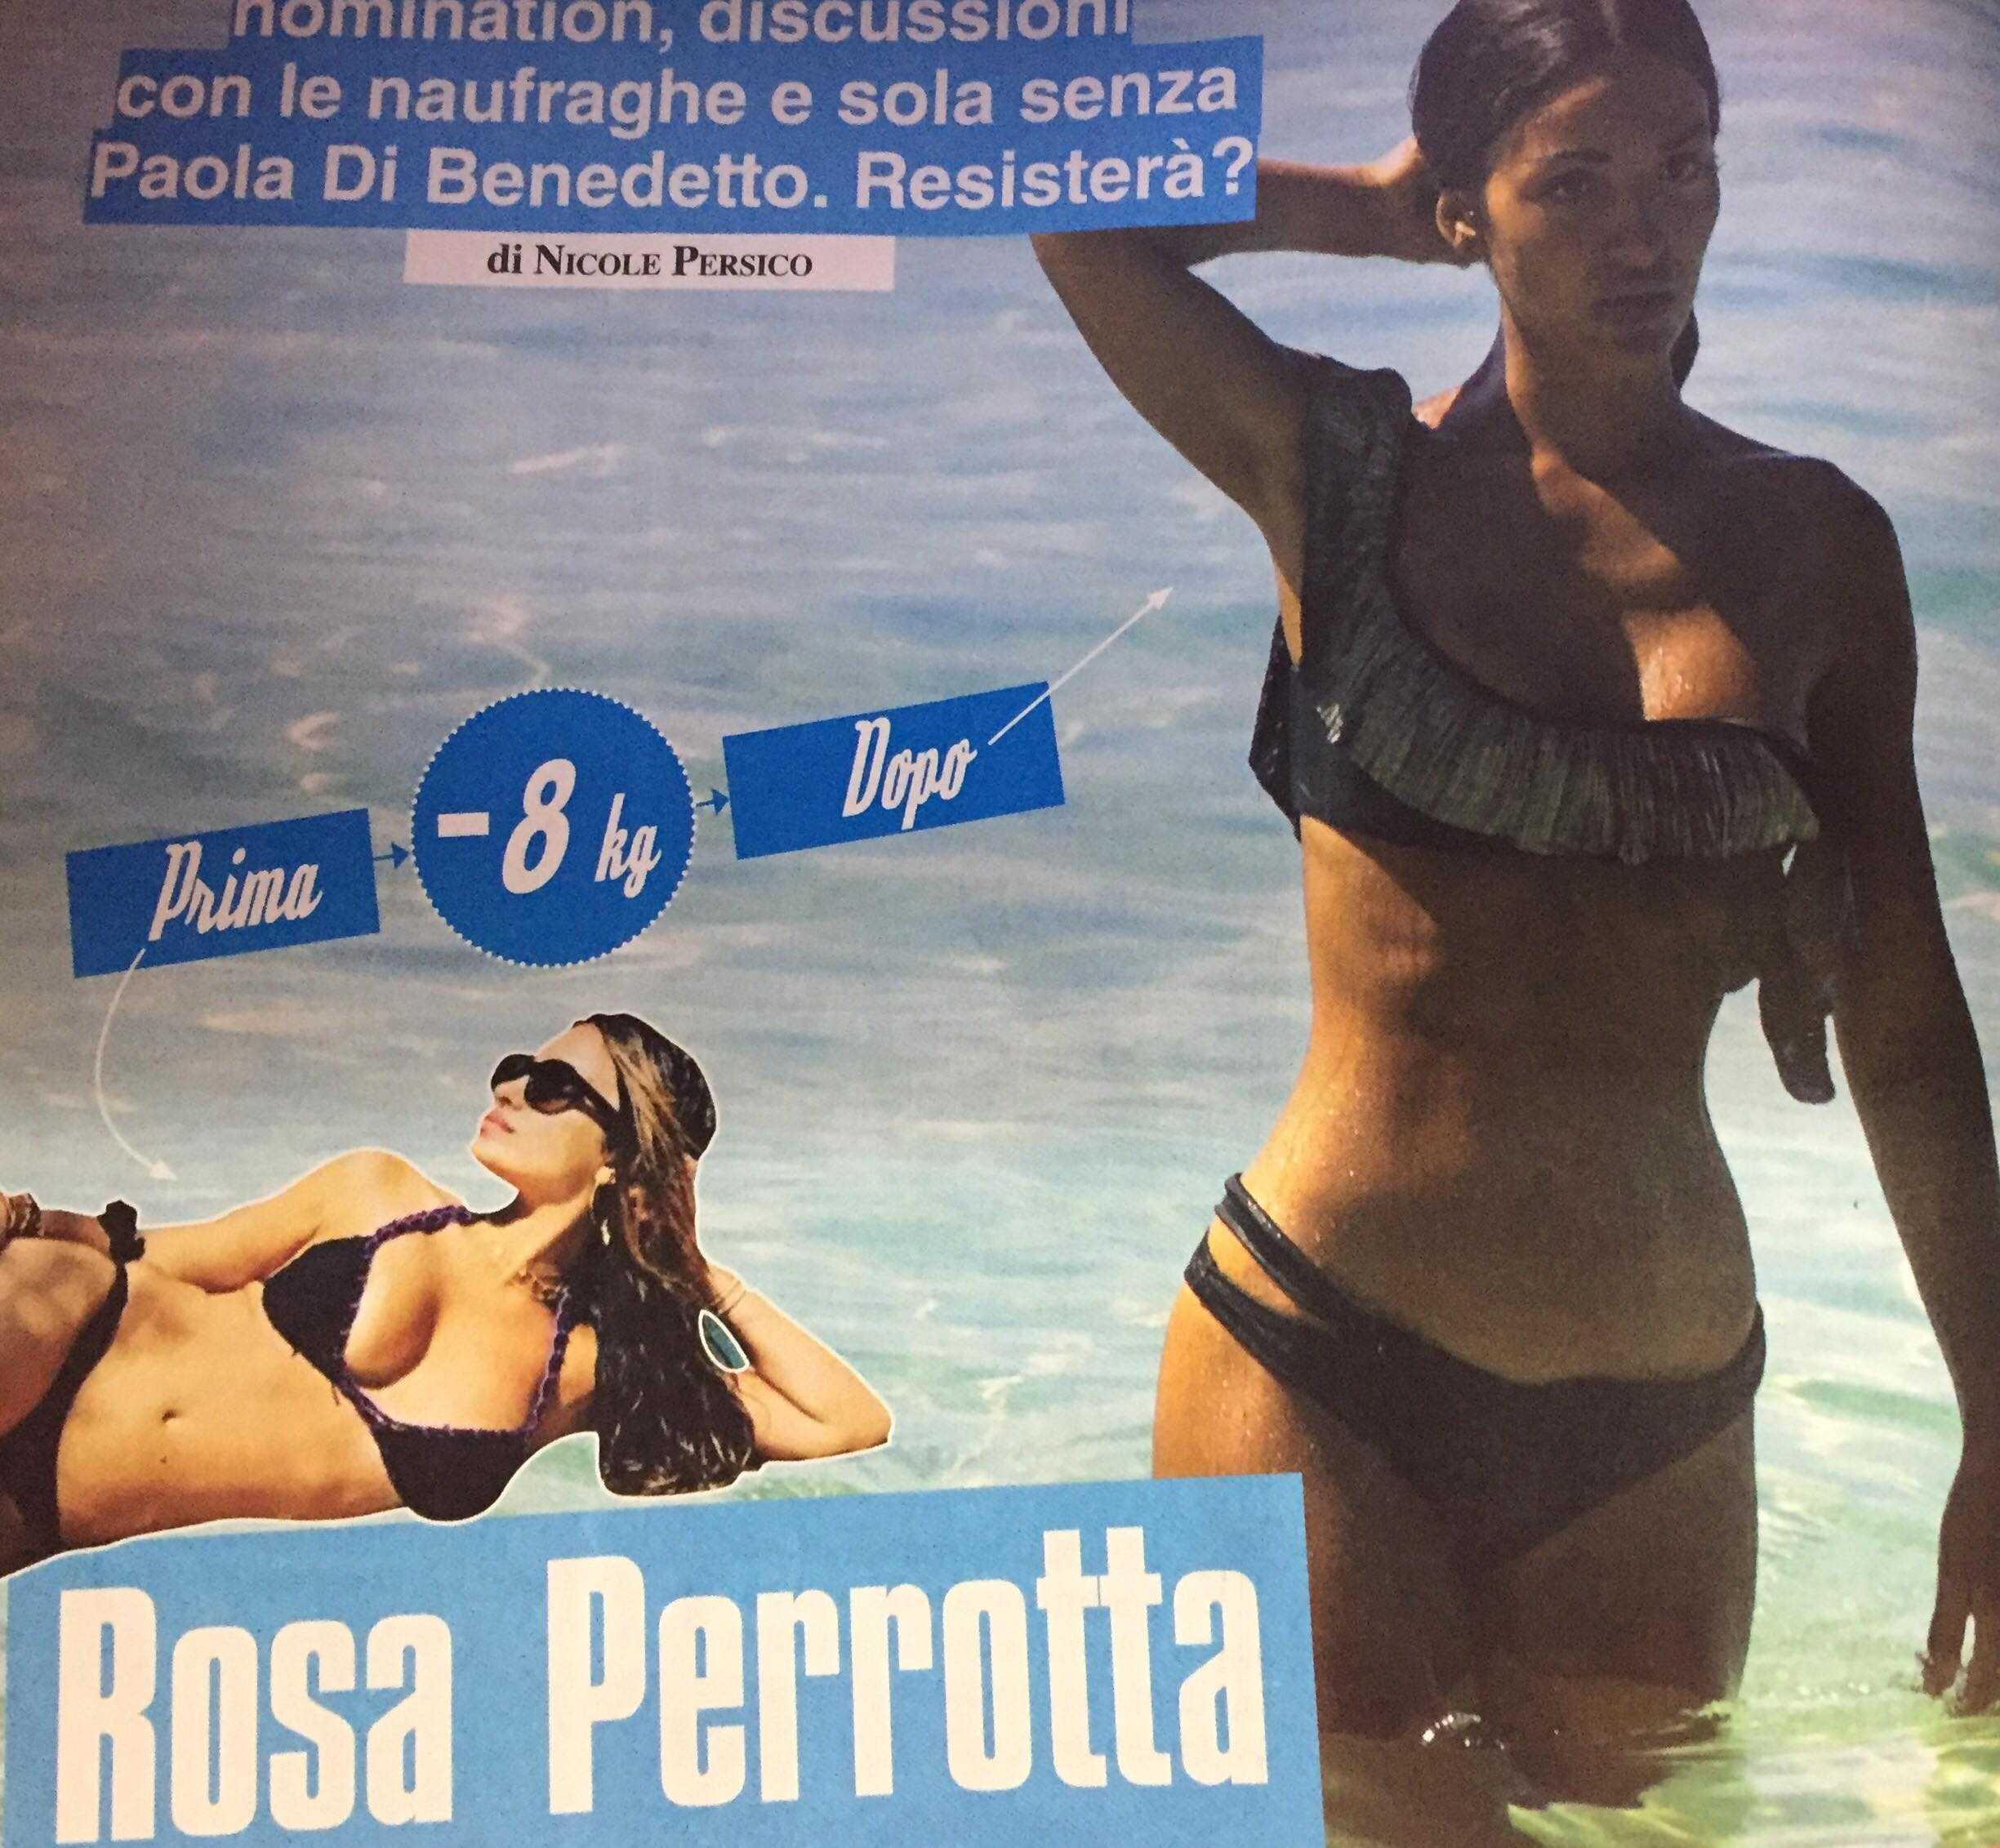 Rosa Perrotta dimagrita isola dei famosi